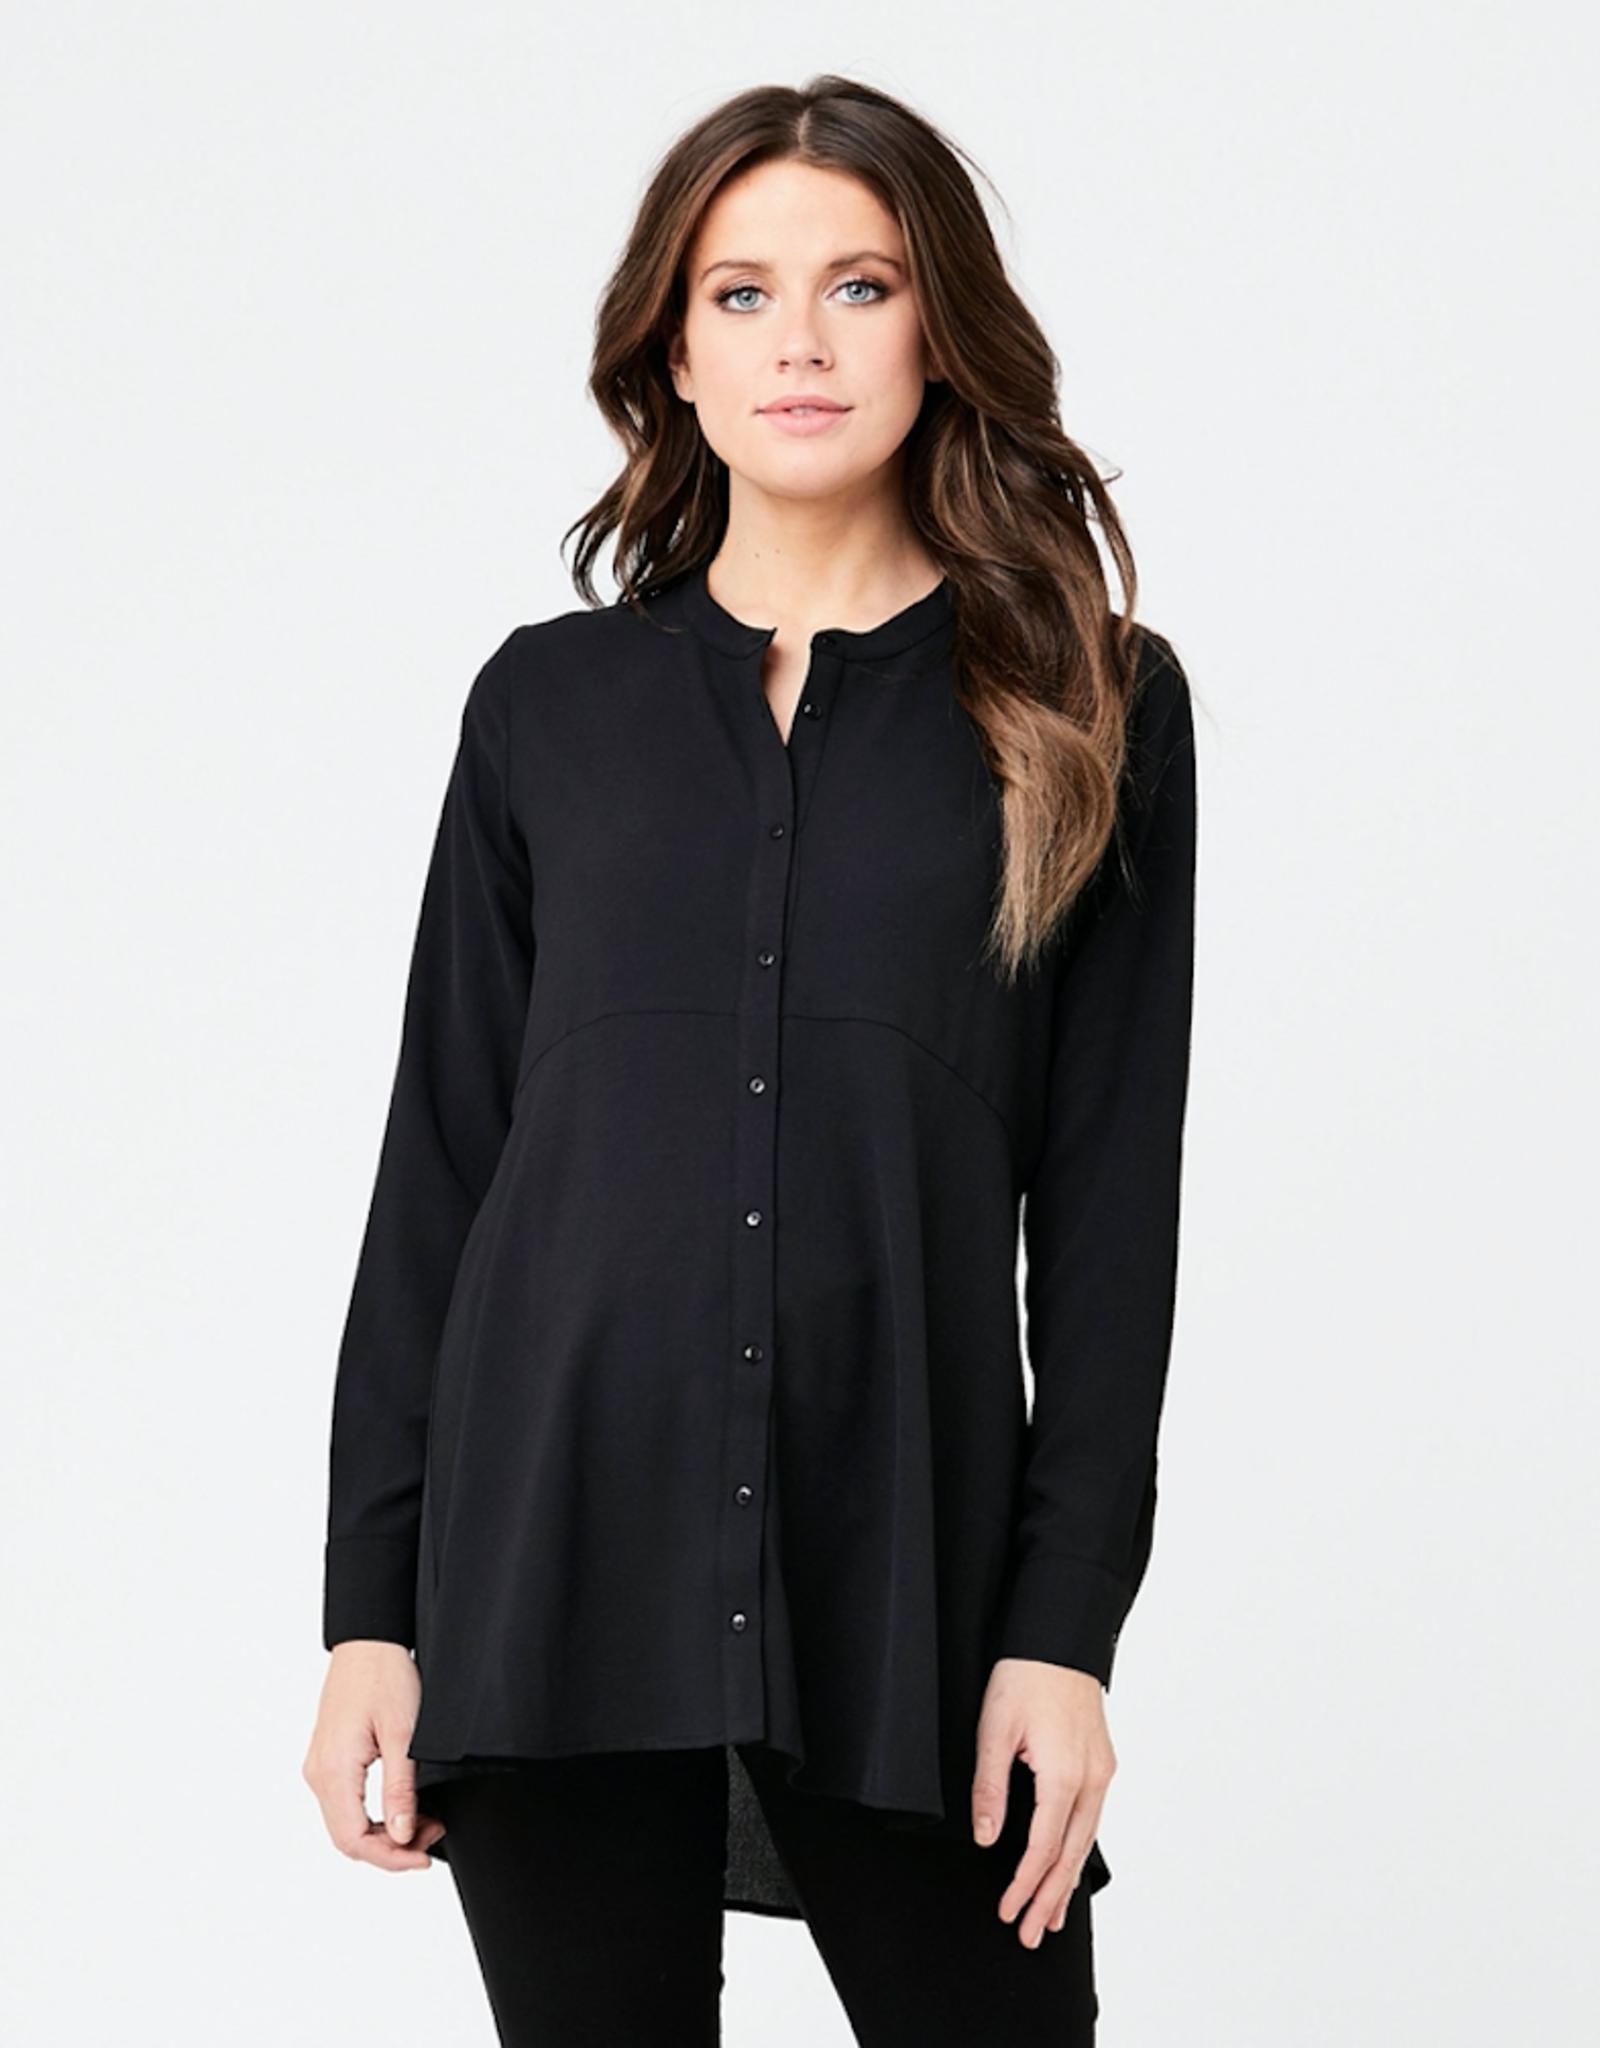 Ripe Maternity Peplum Shirt, Black